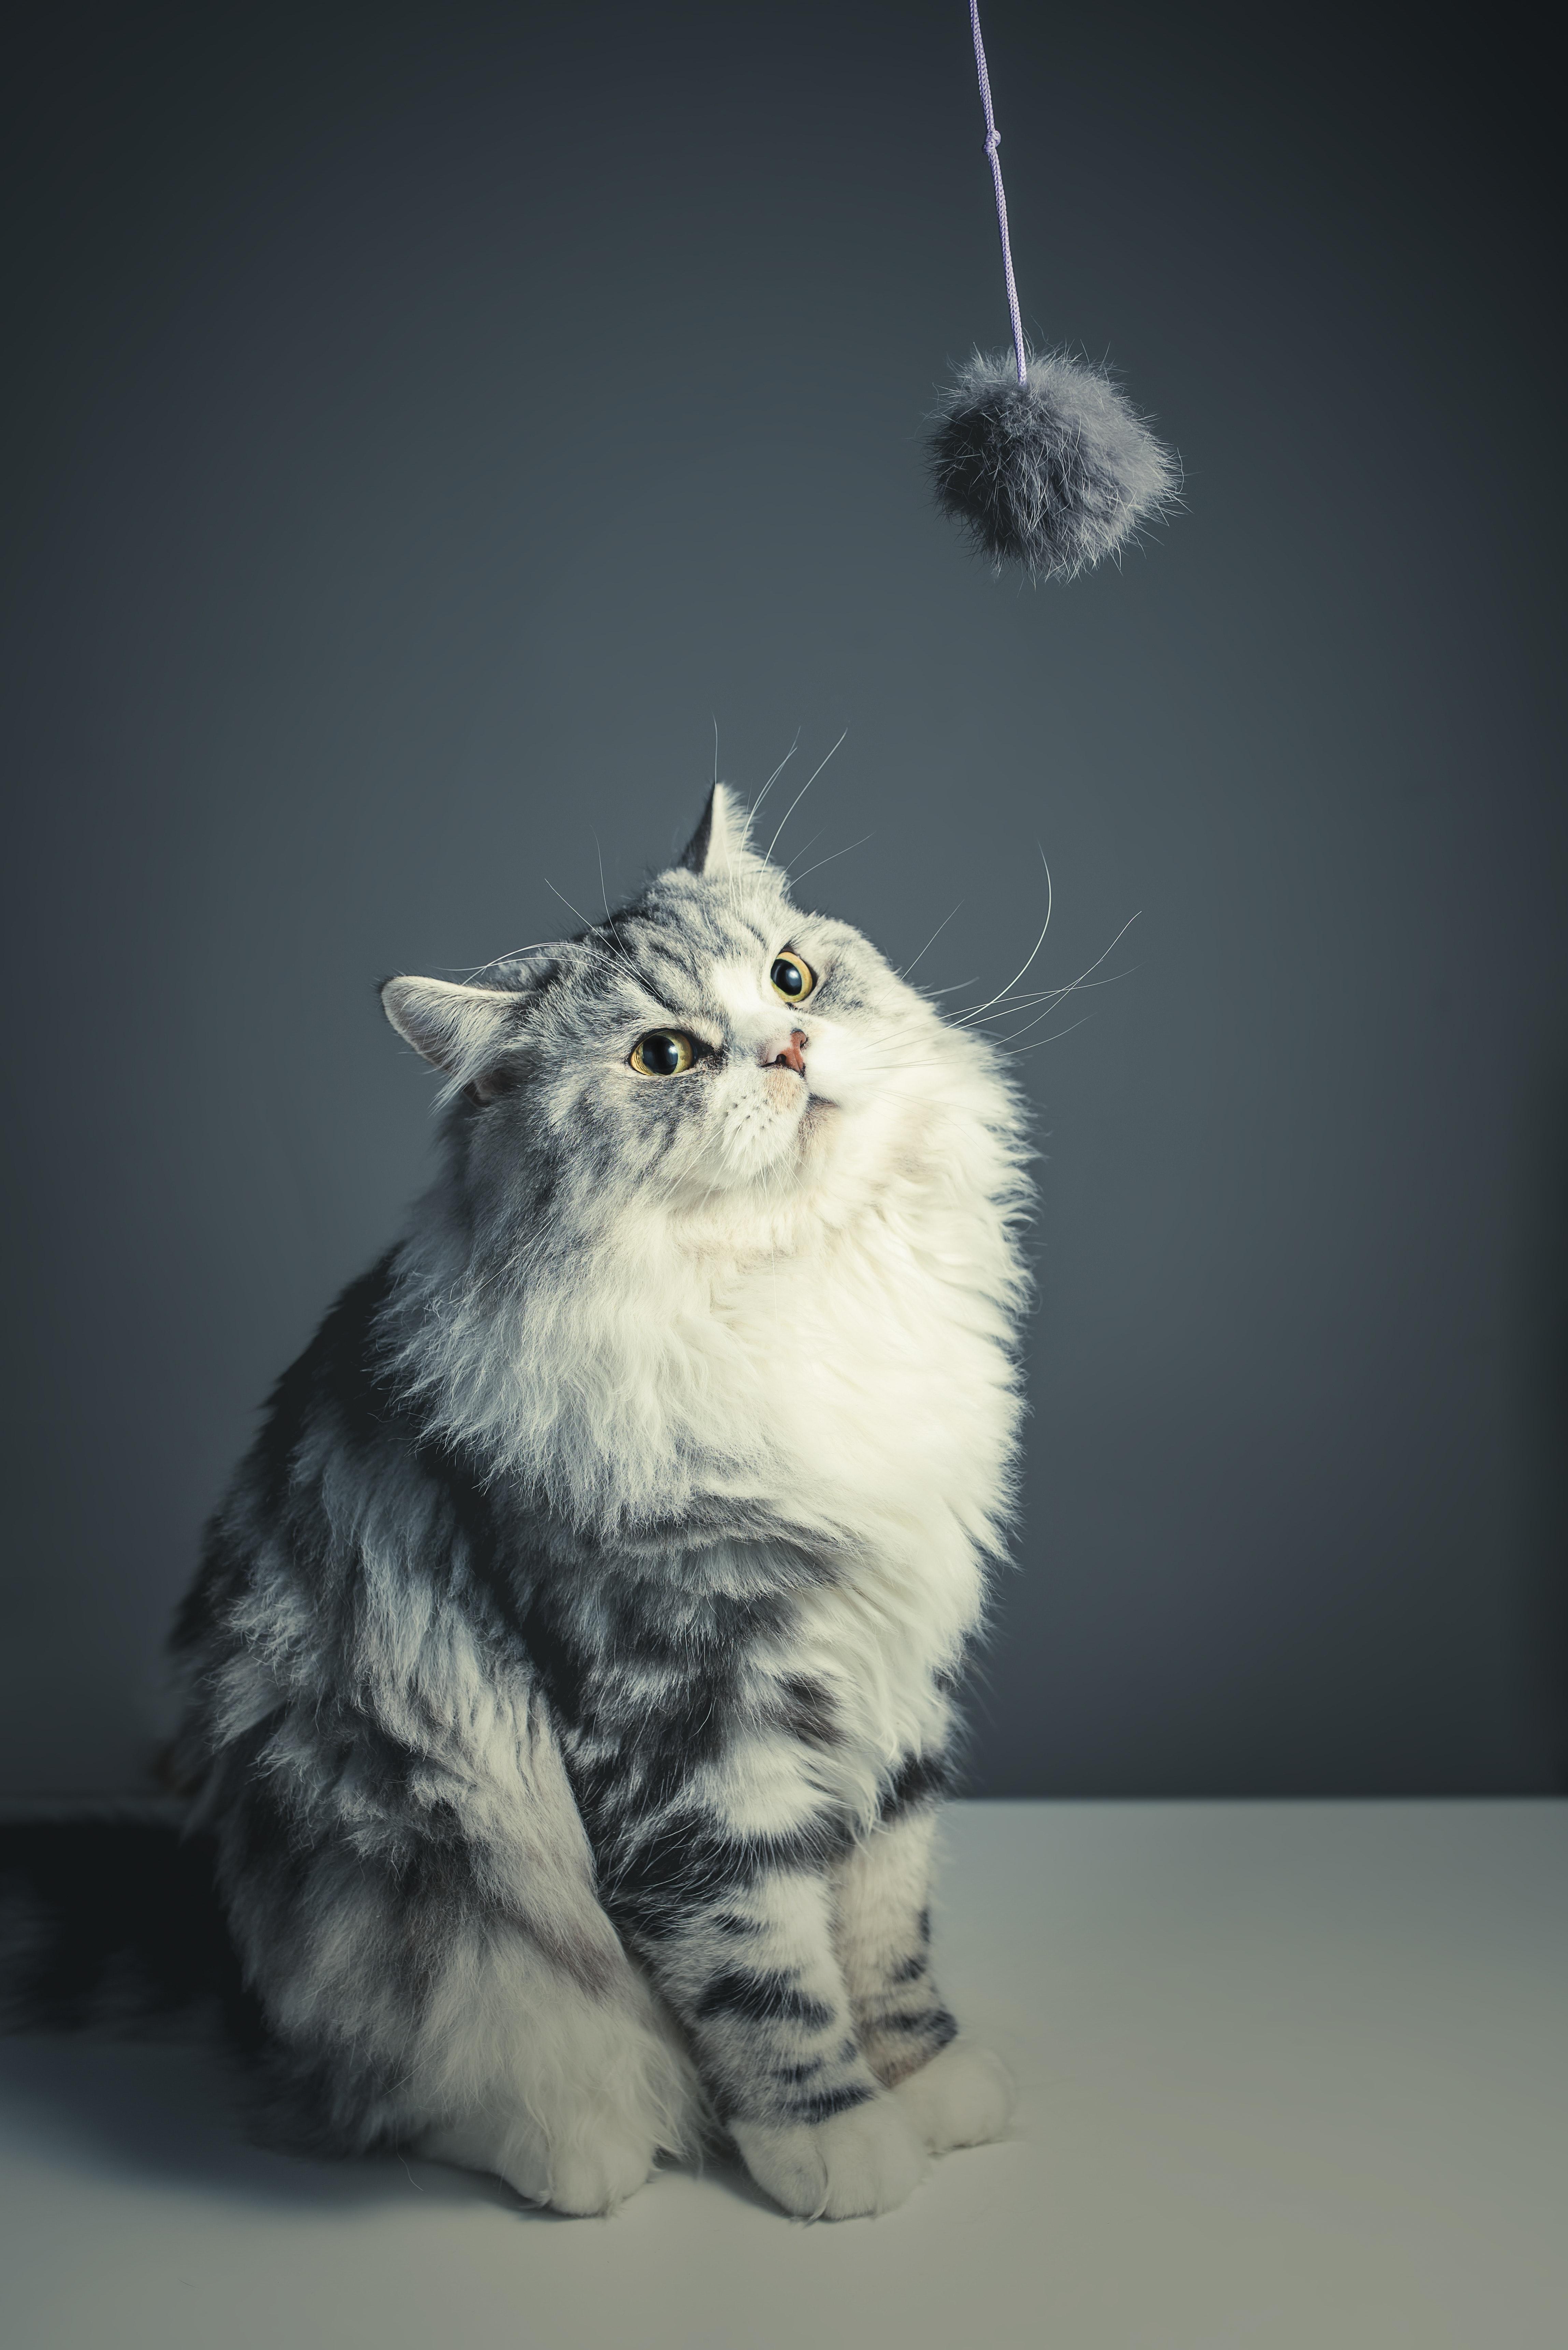 Wallpaper Gambar Kucing Paling Comel Kucingcomel Com